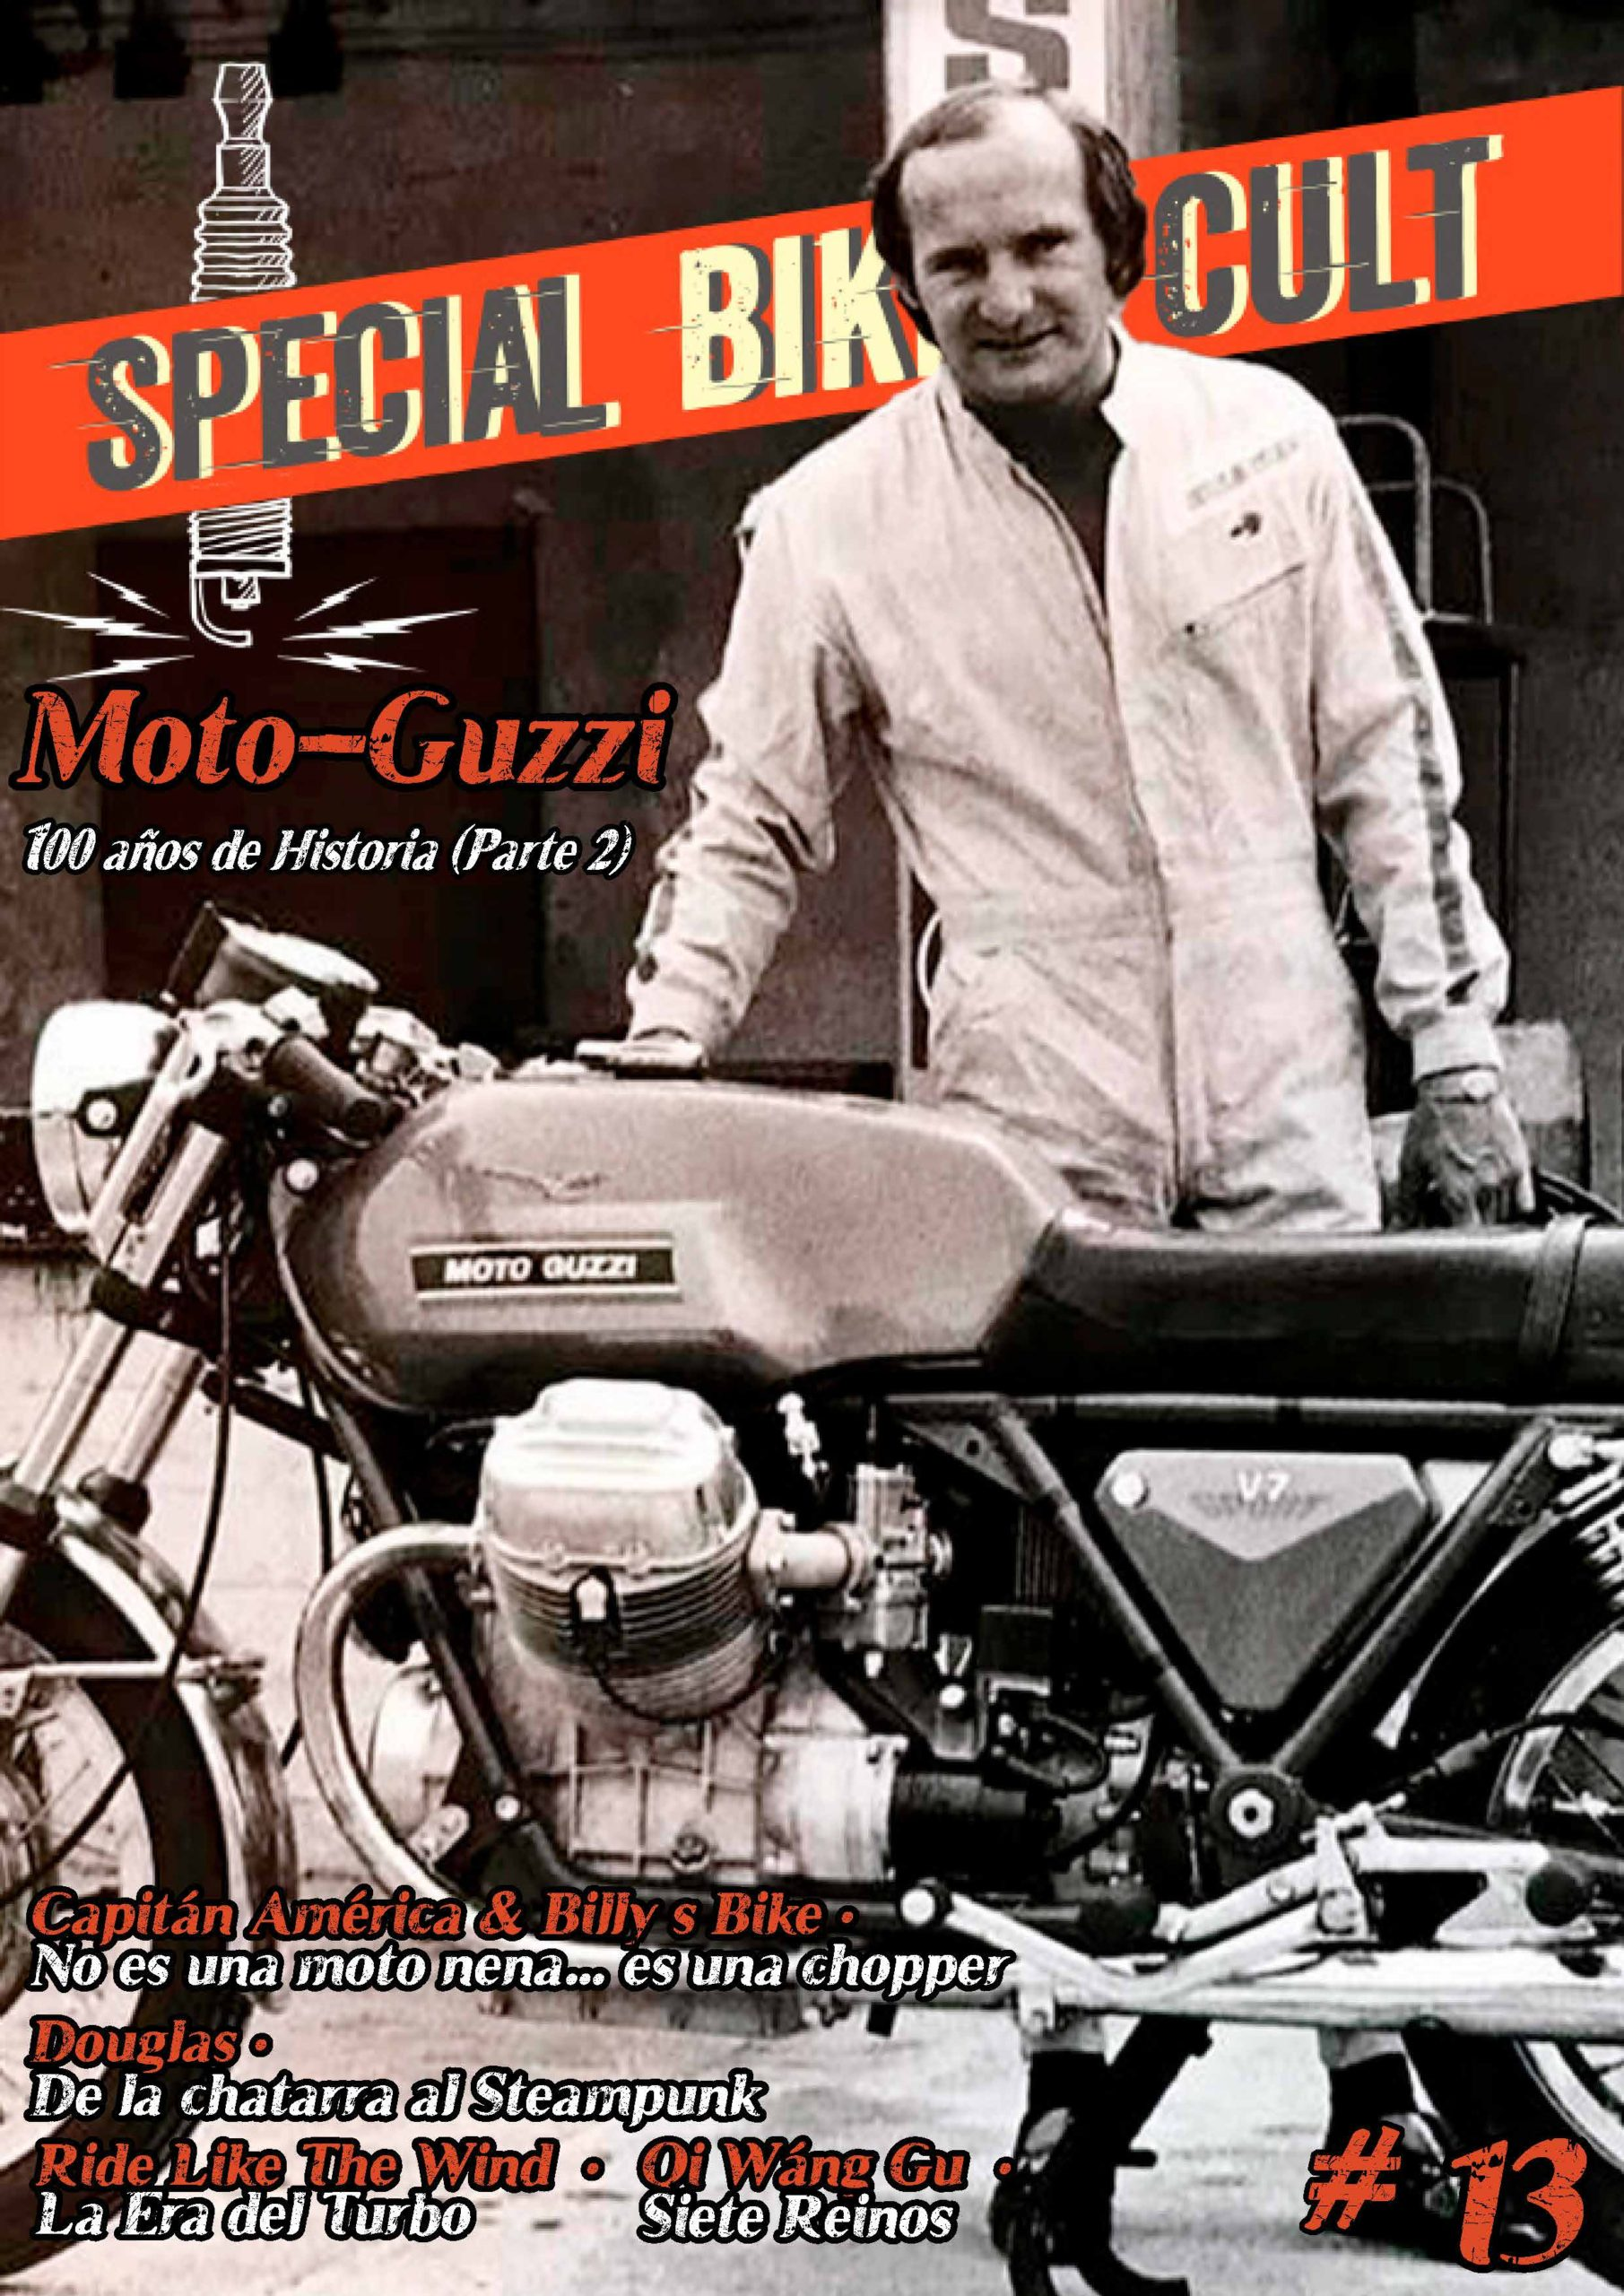 Special Bikes Cult #13